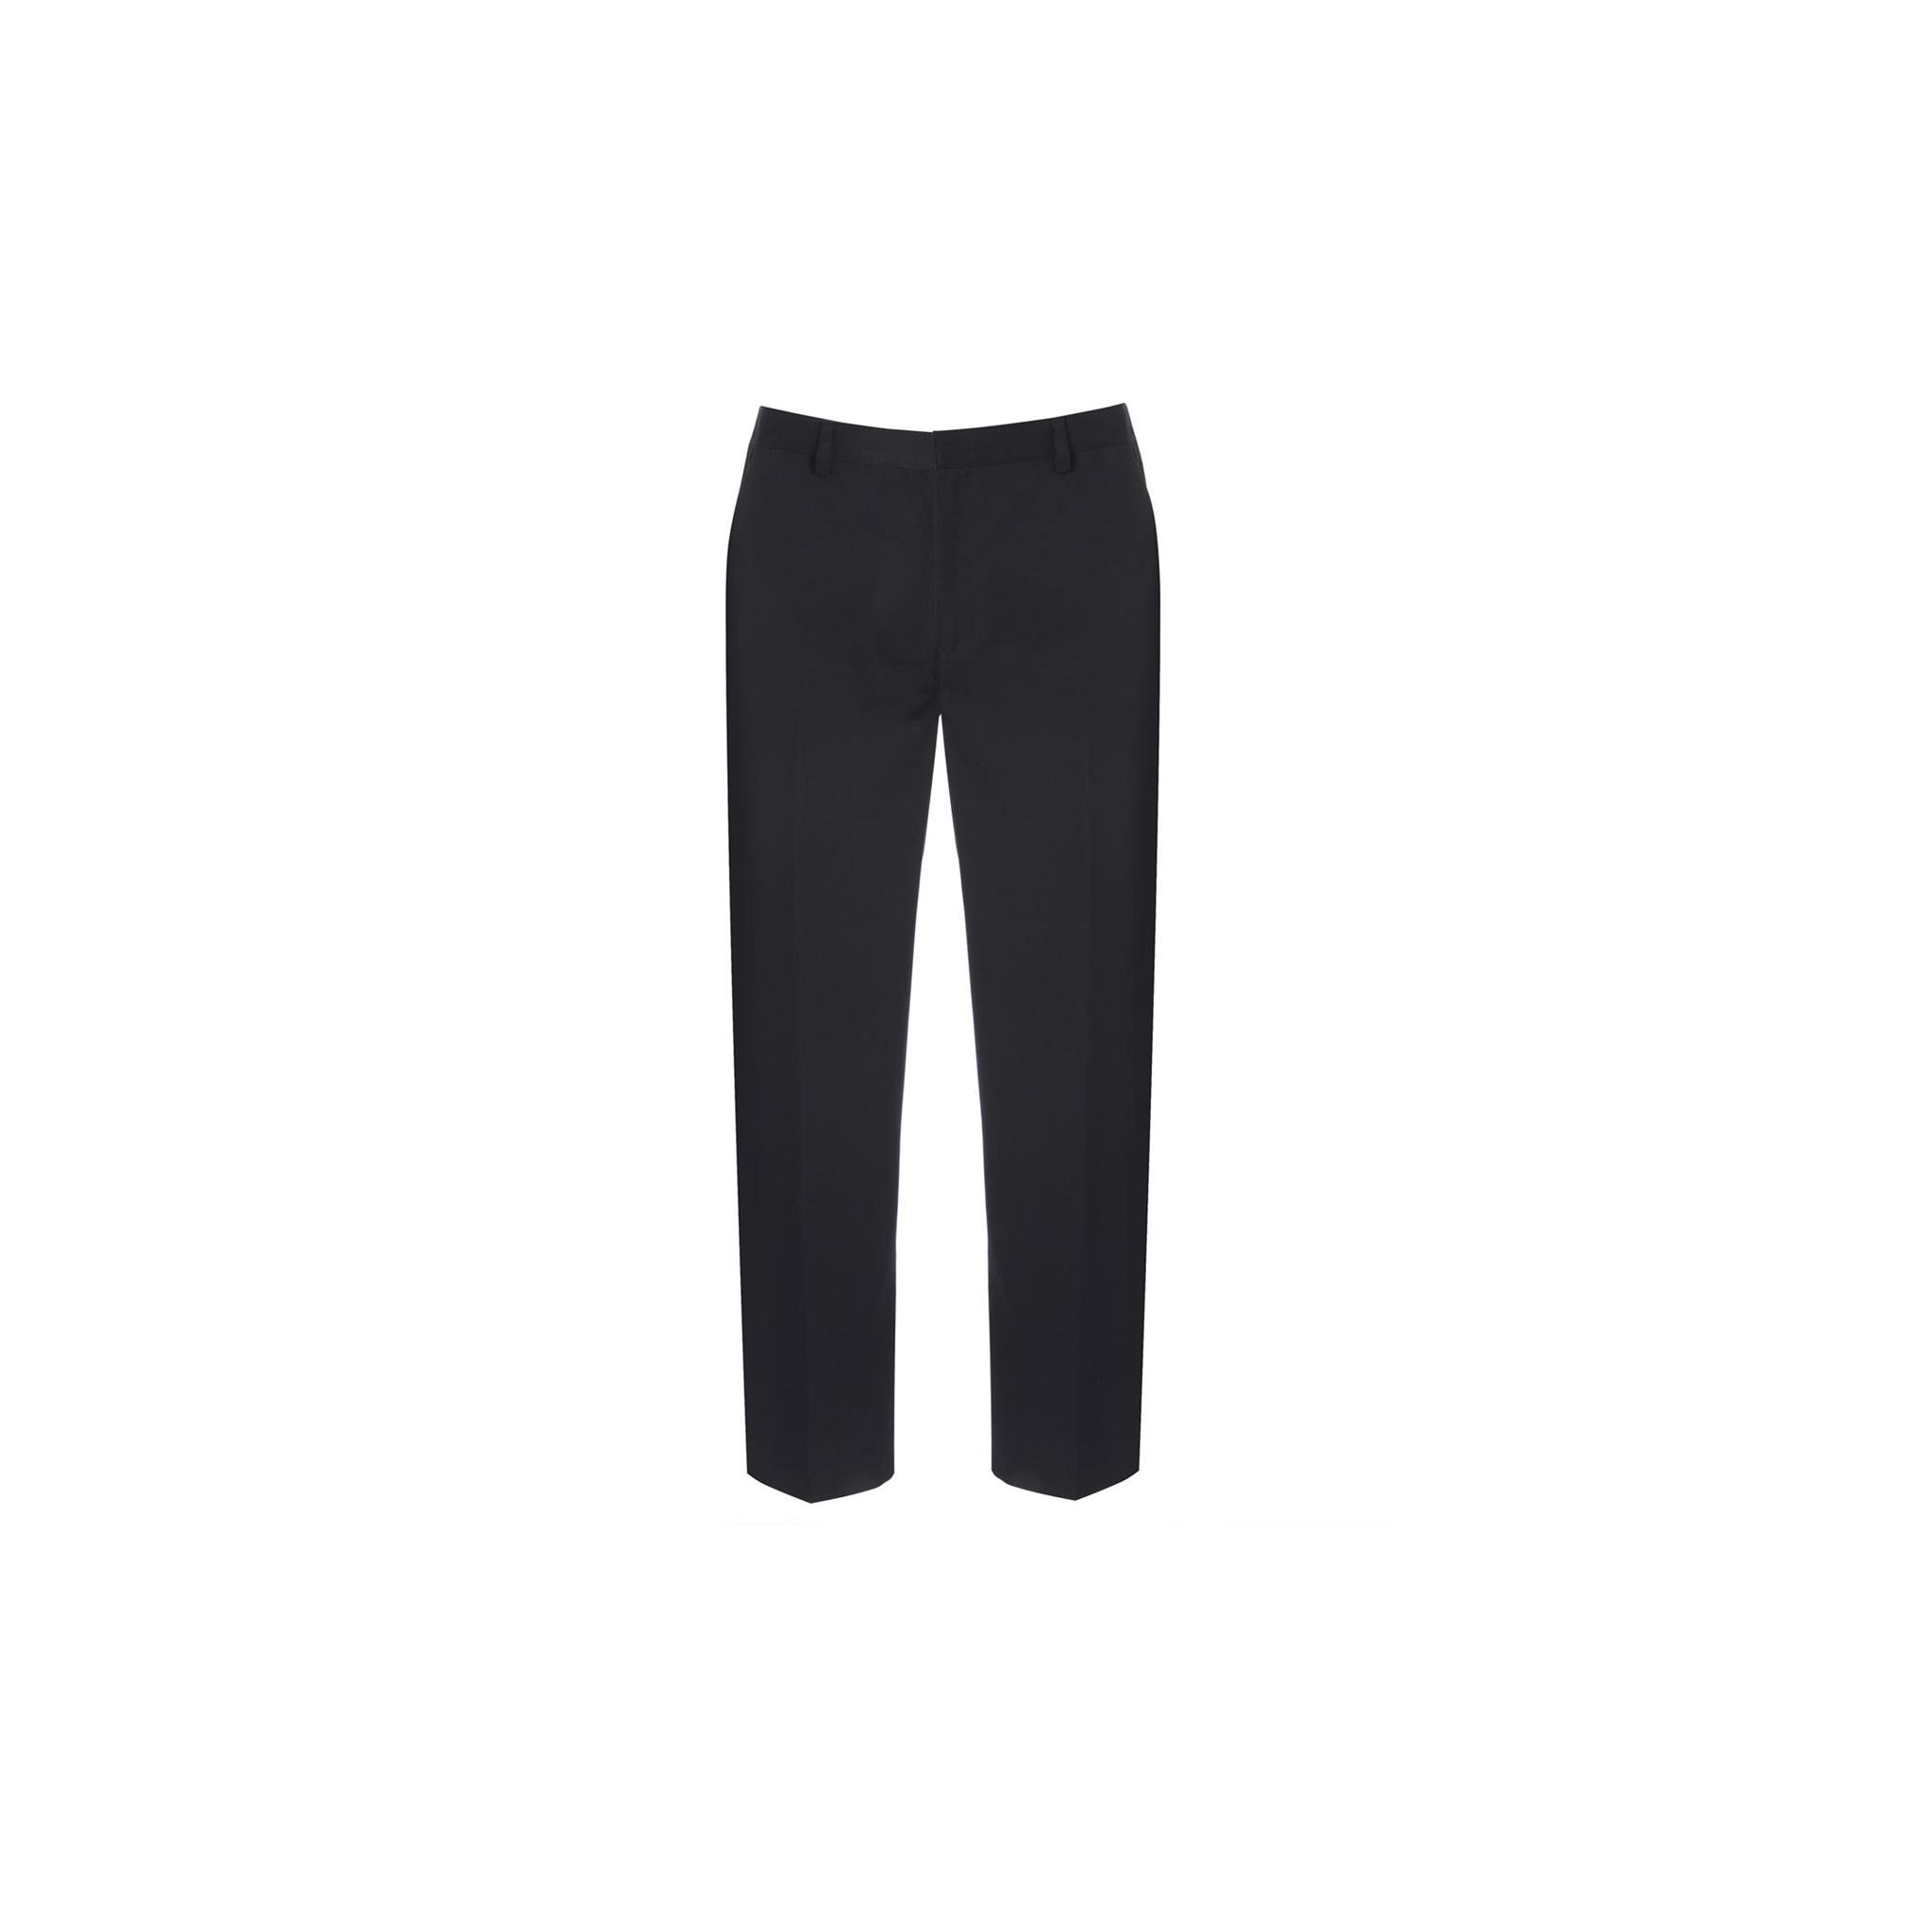 navy-half-elastic-waist_fr-1